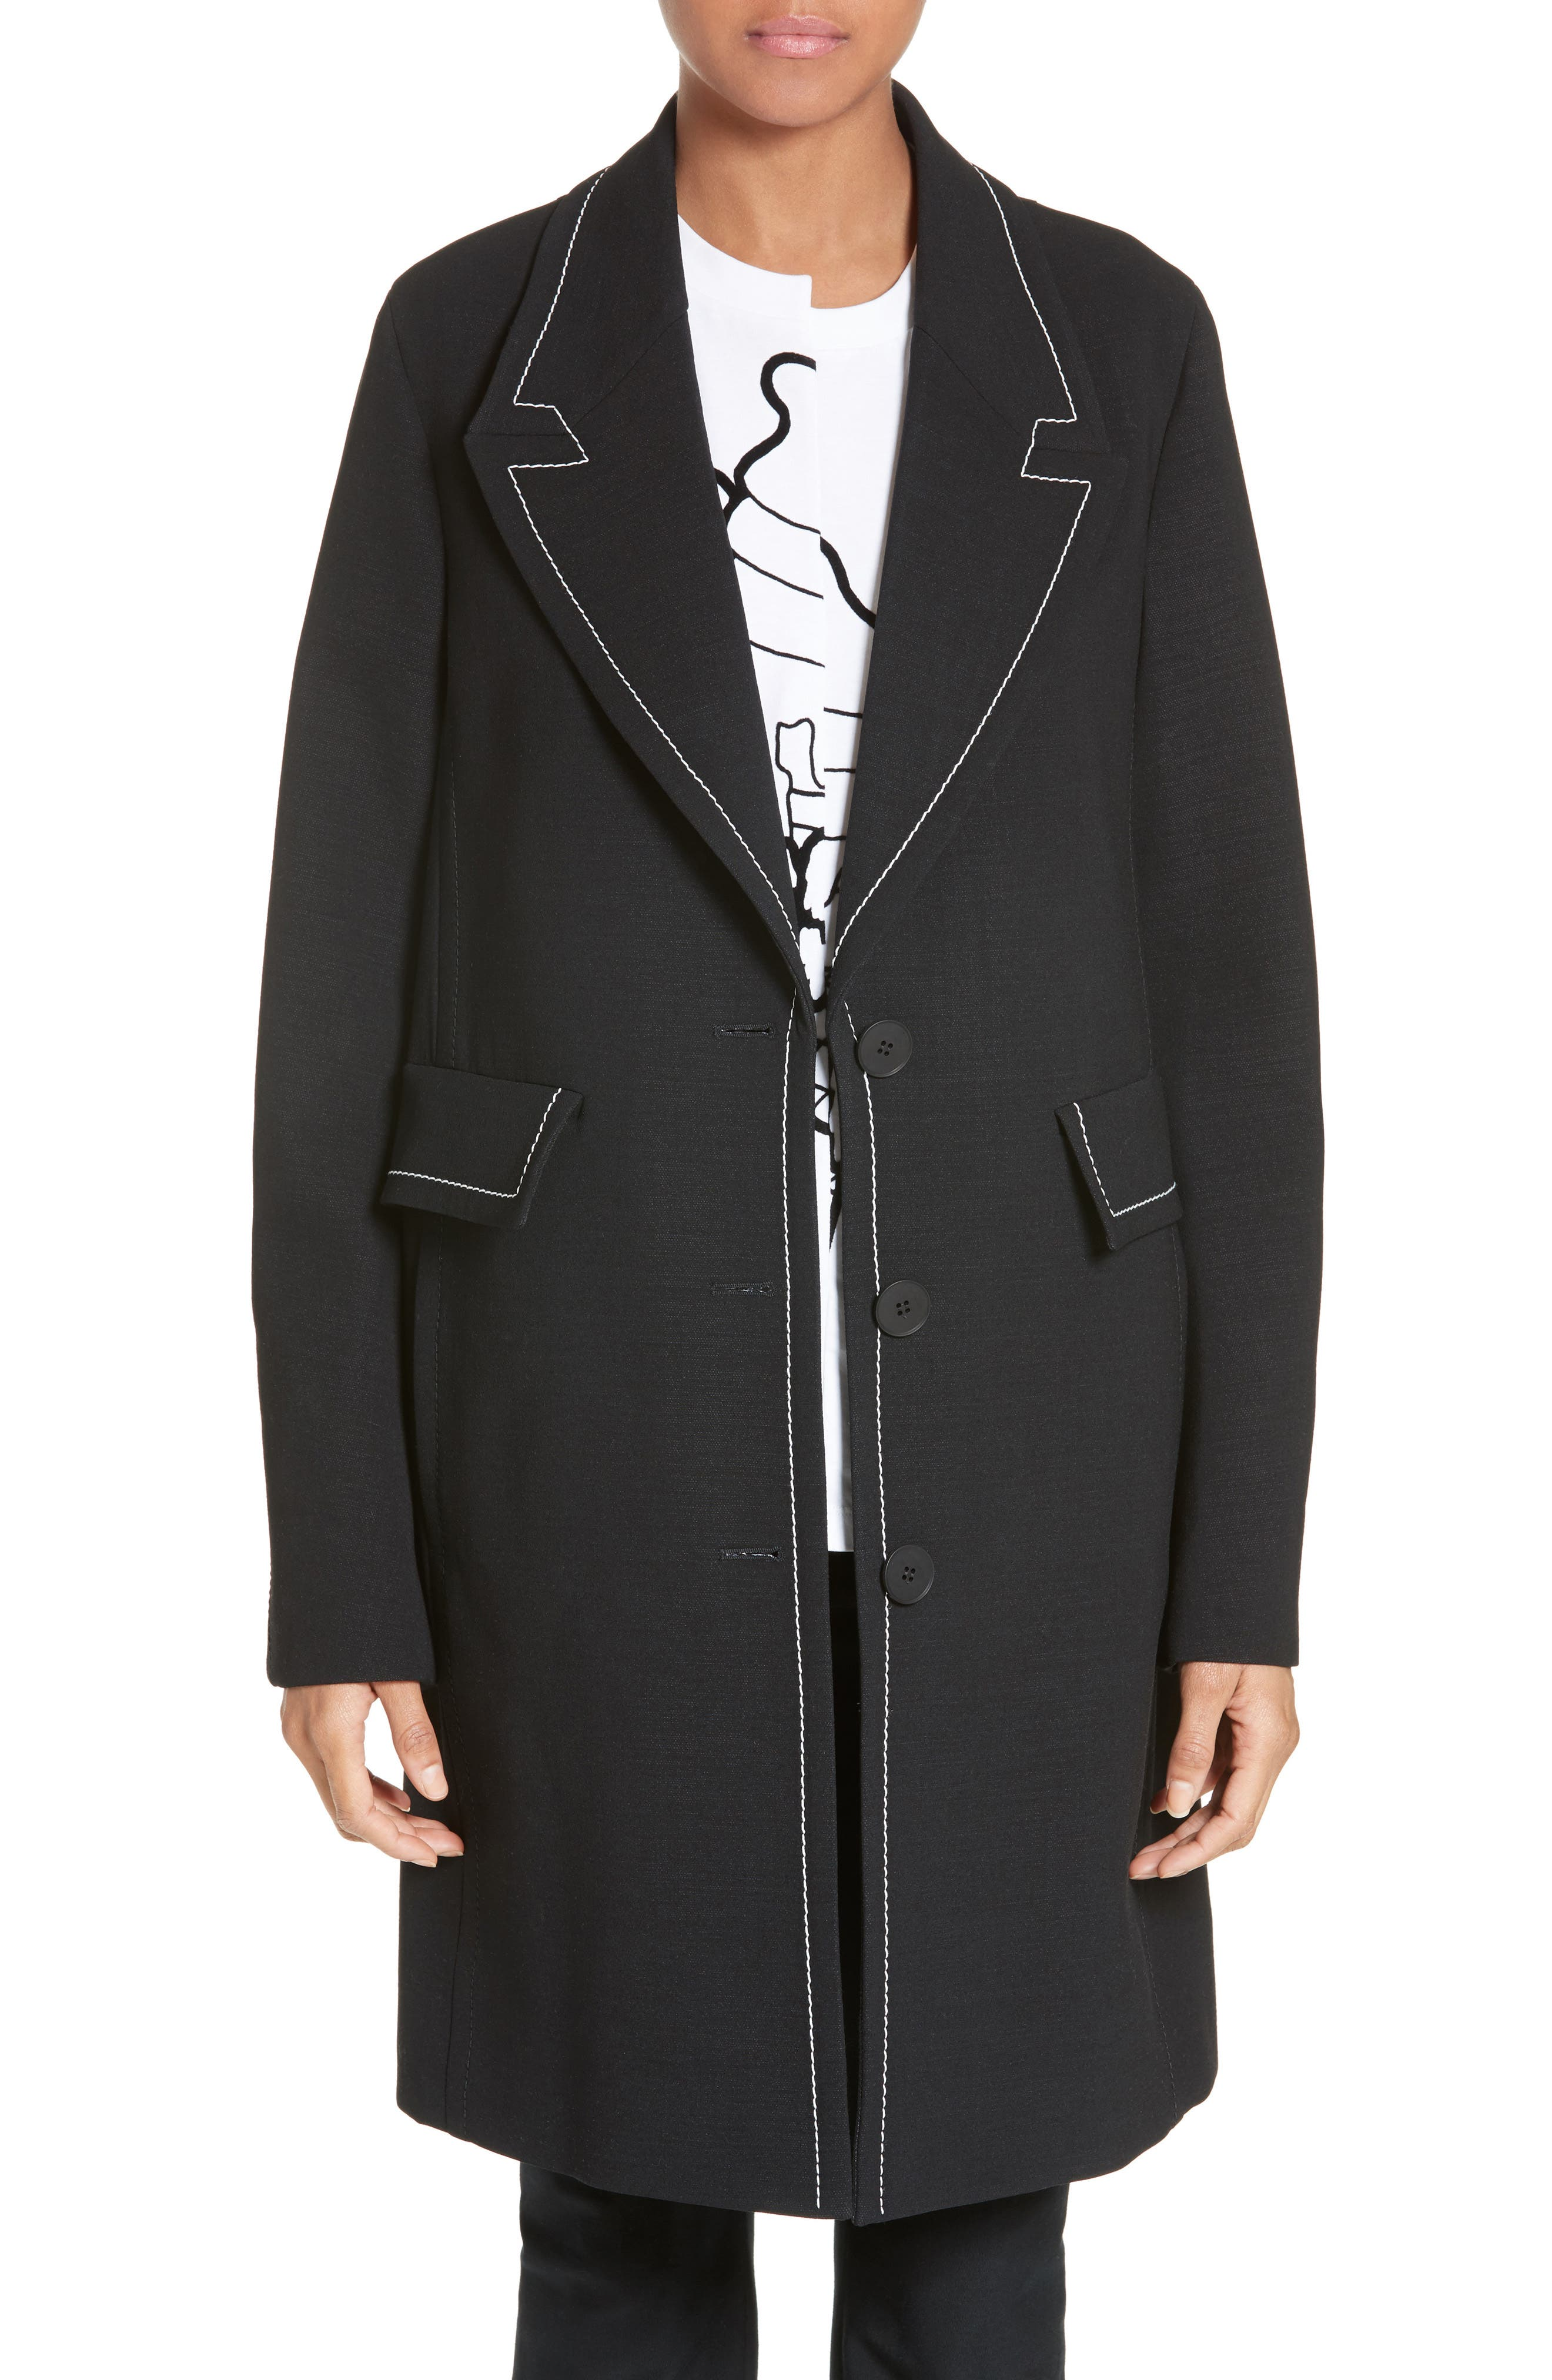 Marcelline Topstitch Double Face Wool Coat,                         Main,                         color, Black/ Mistletoe